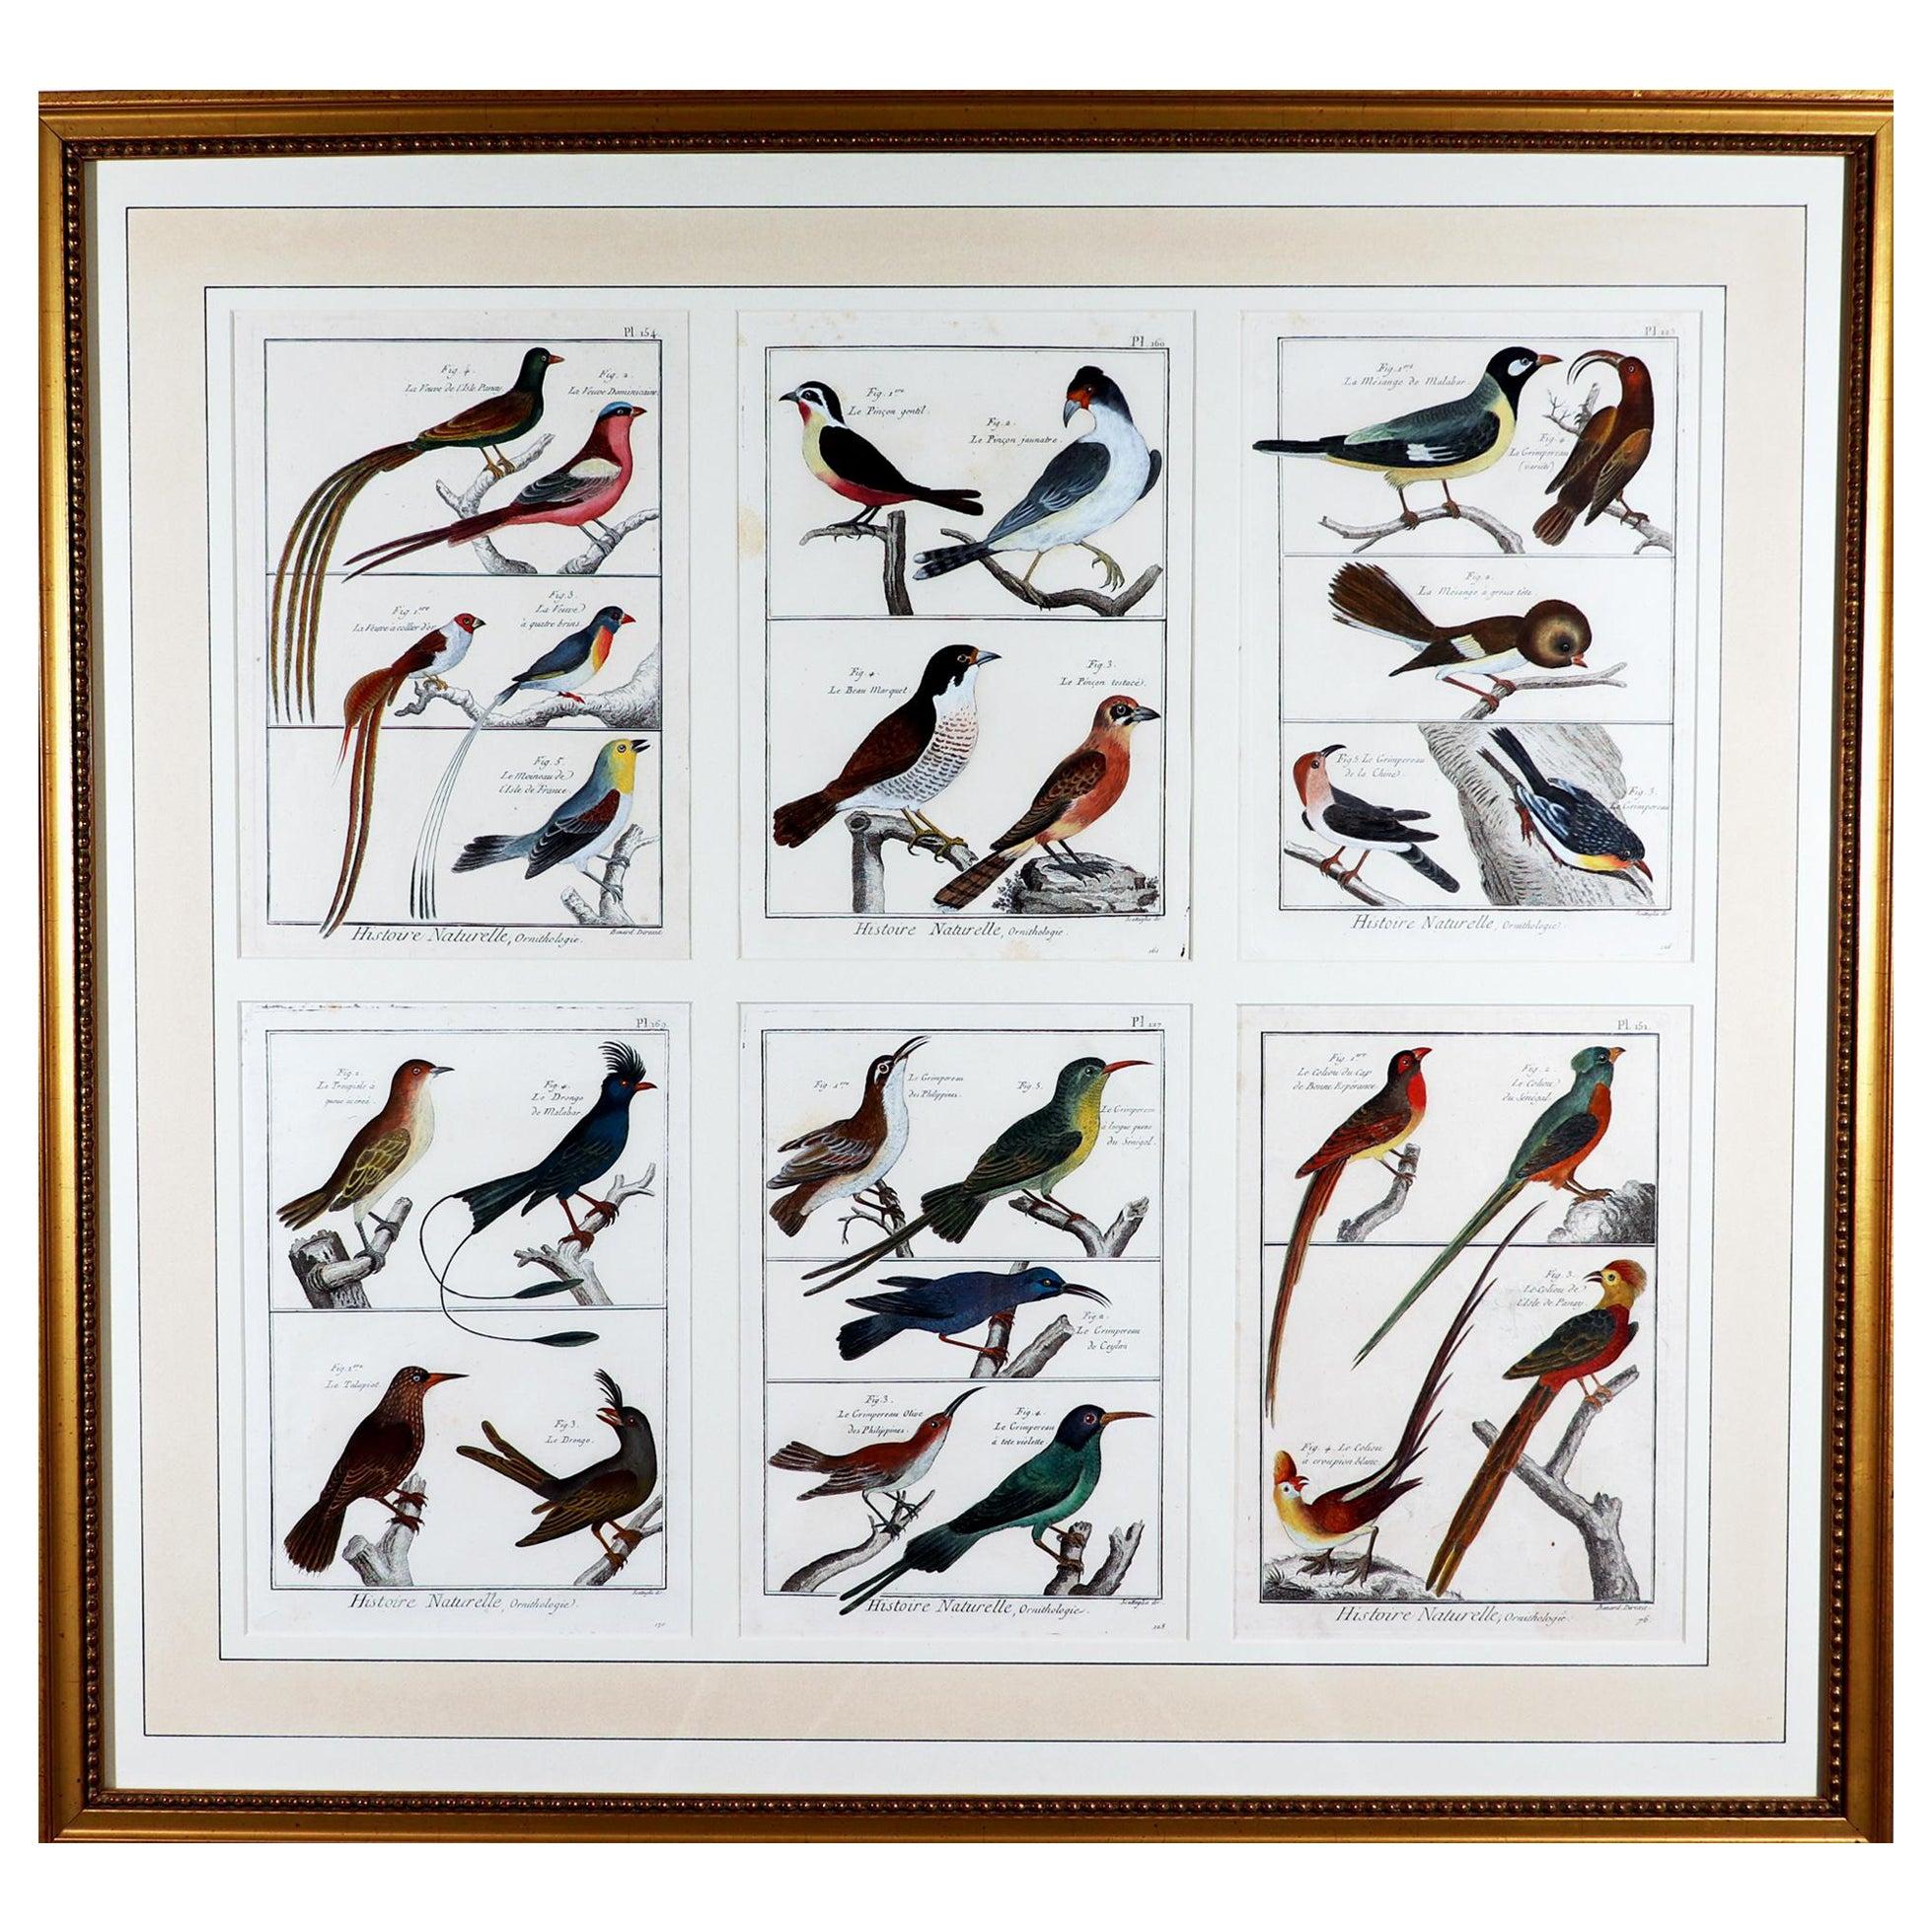 Framed Group of 18th Century Bird Engravings